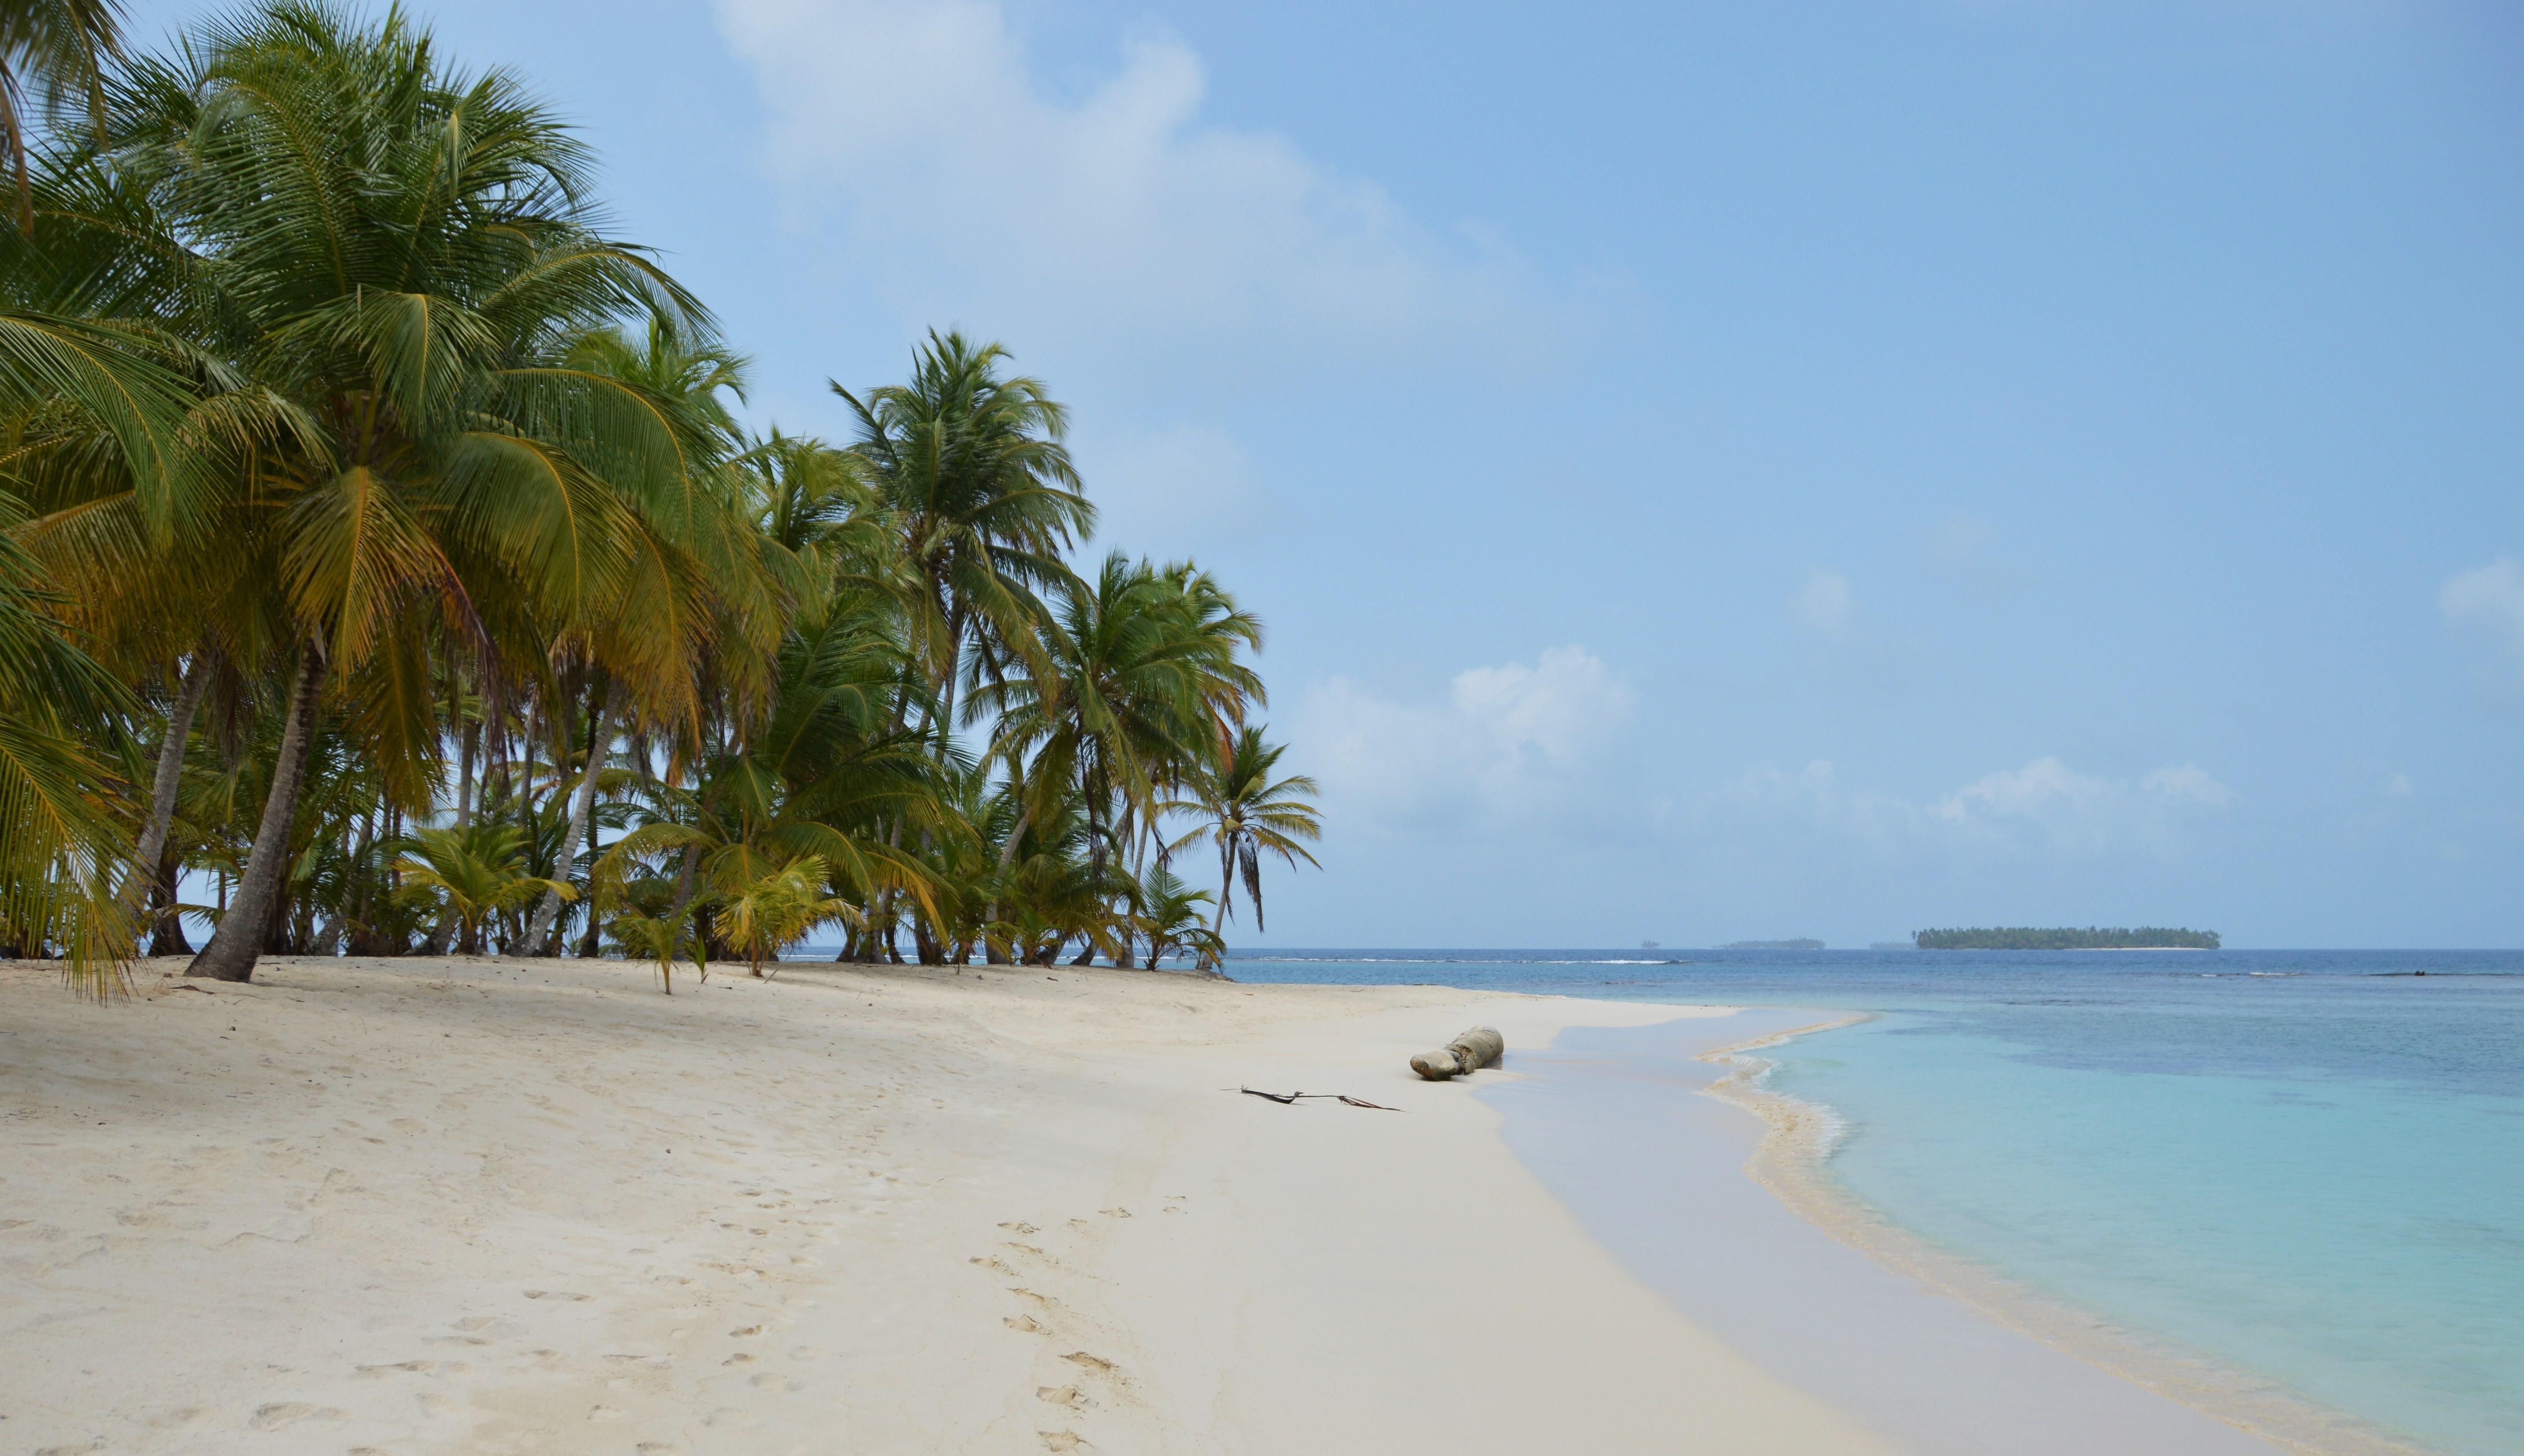 De mooiste paradijselijke stranden